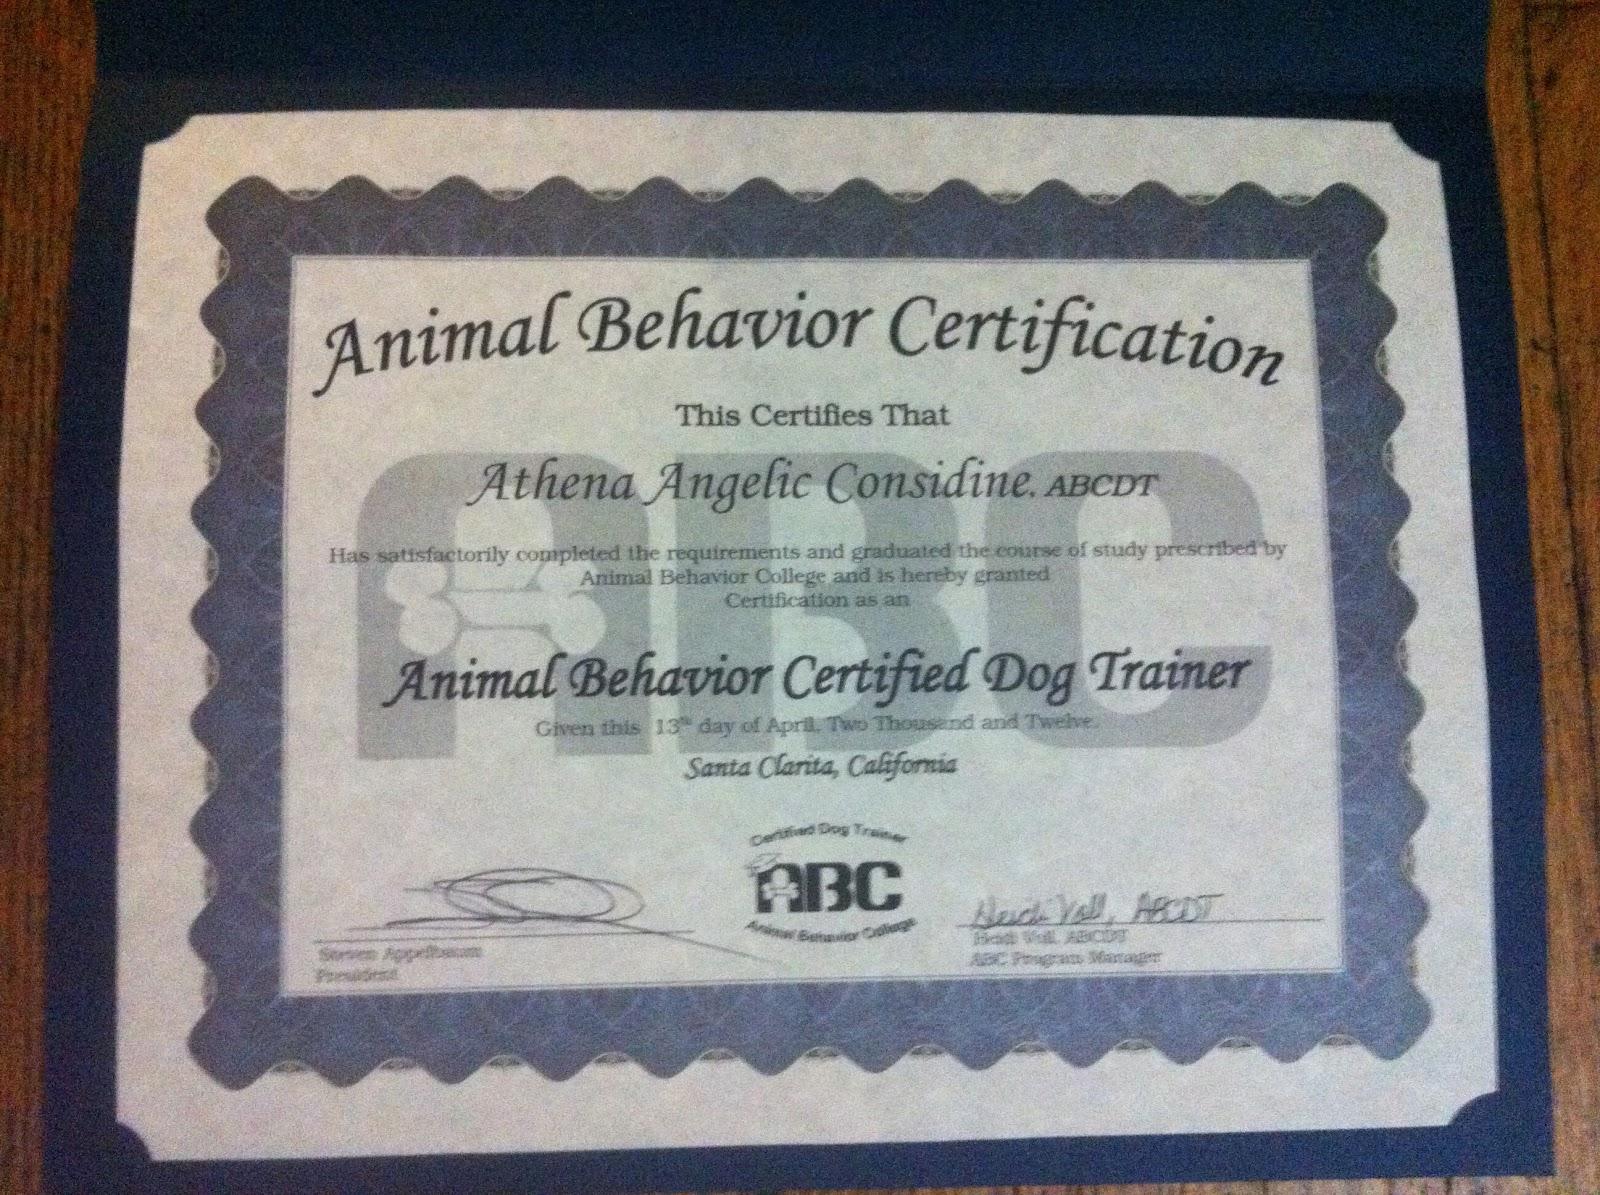 Such Good Dogs Animal Behavior Certified Dog Trainer